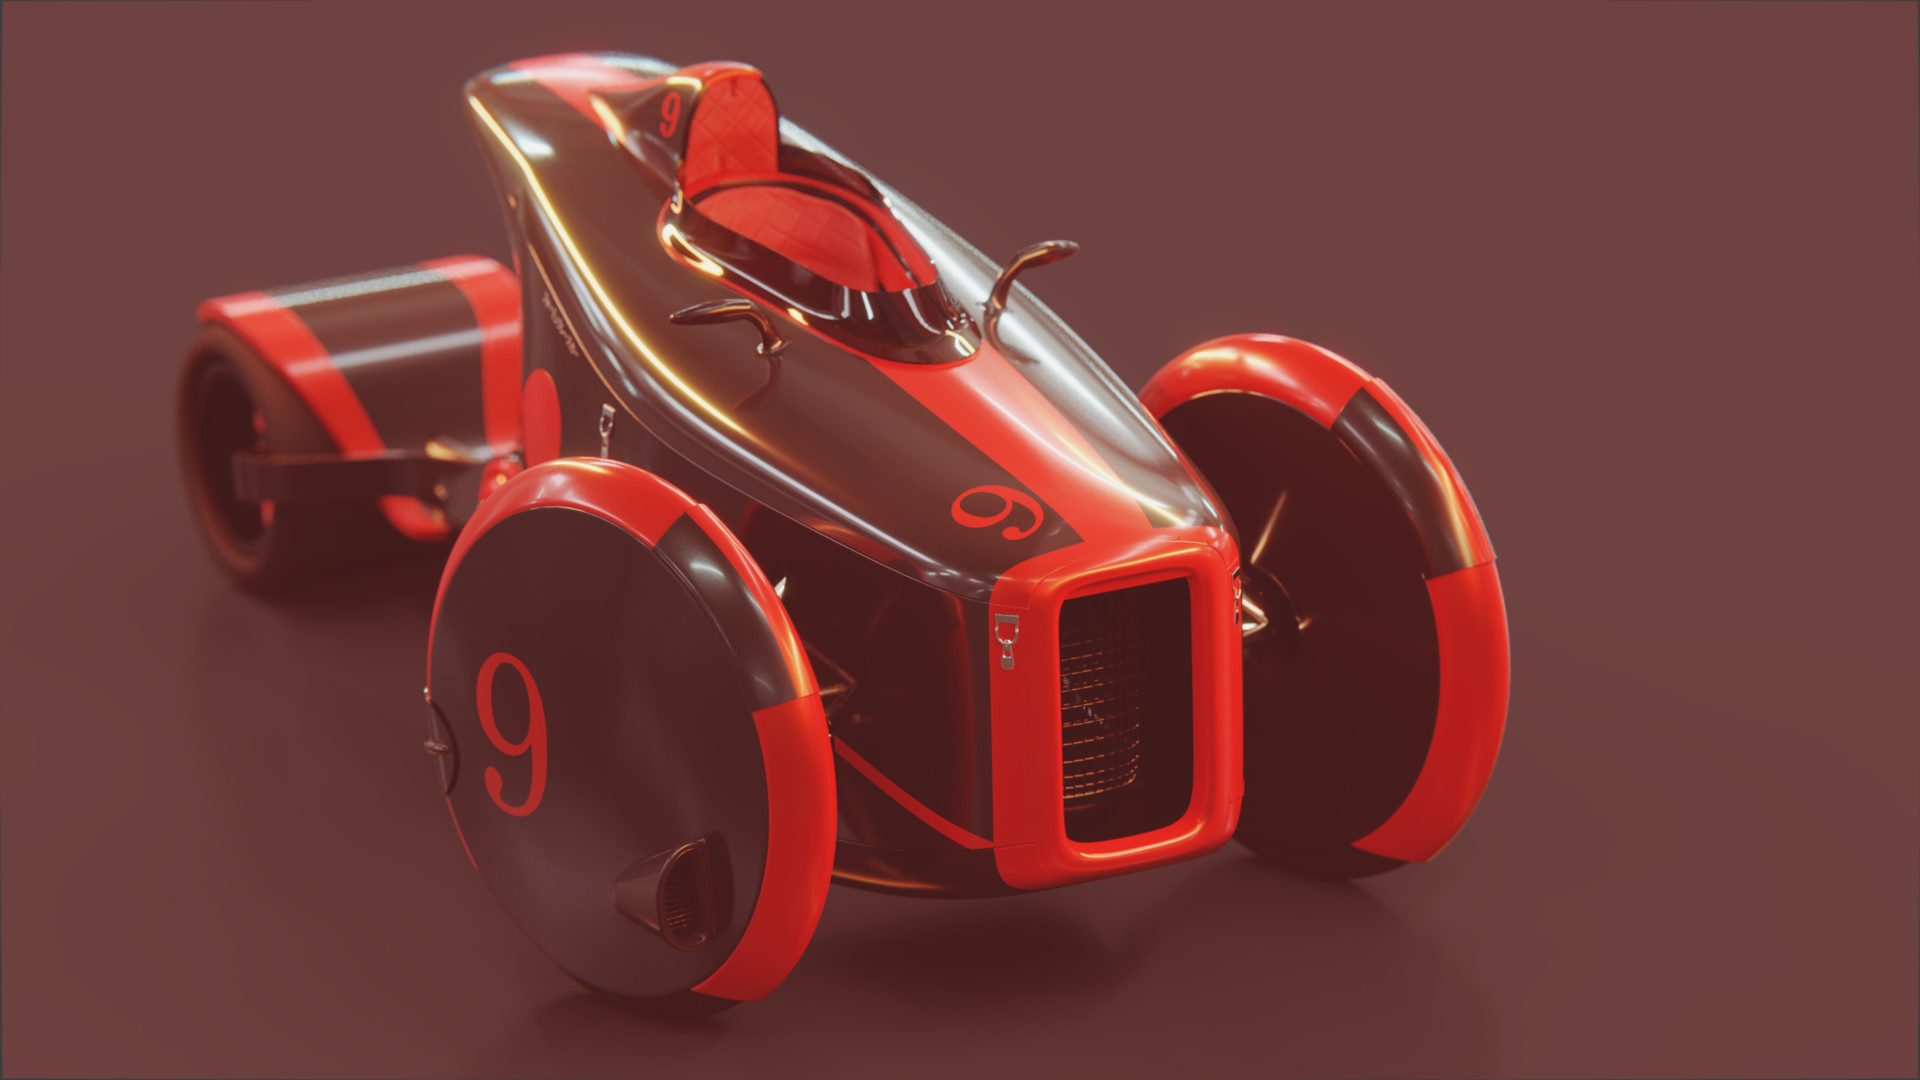 Victor duarte racecar 2 final